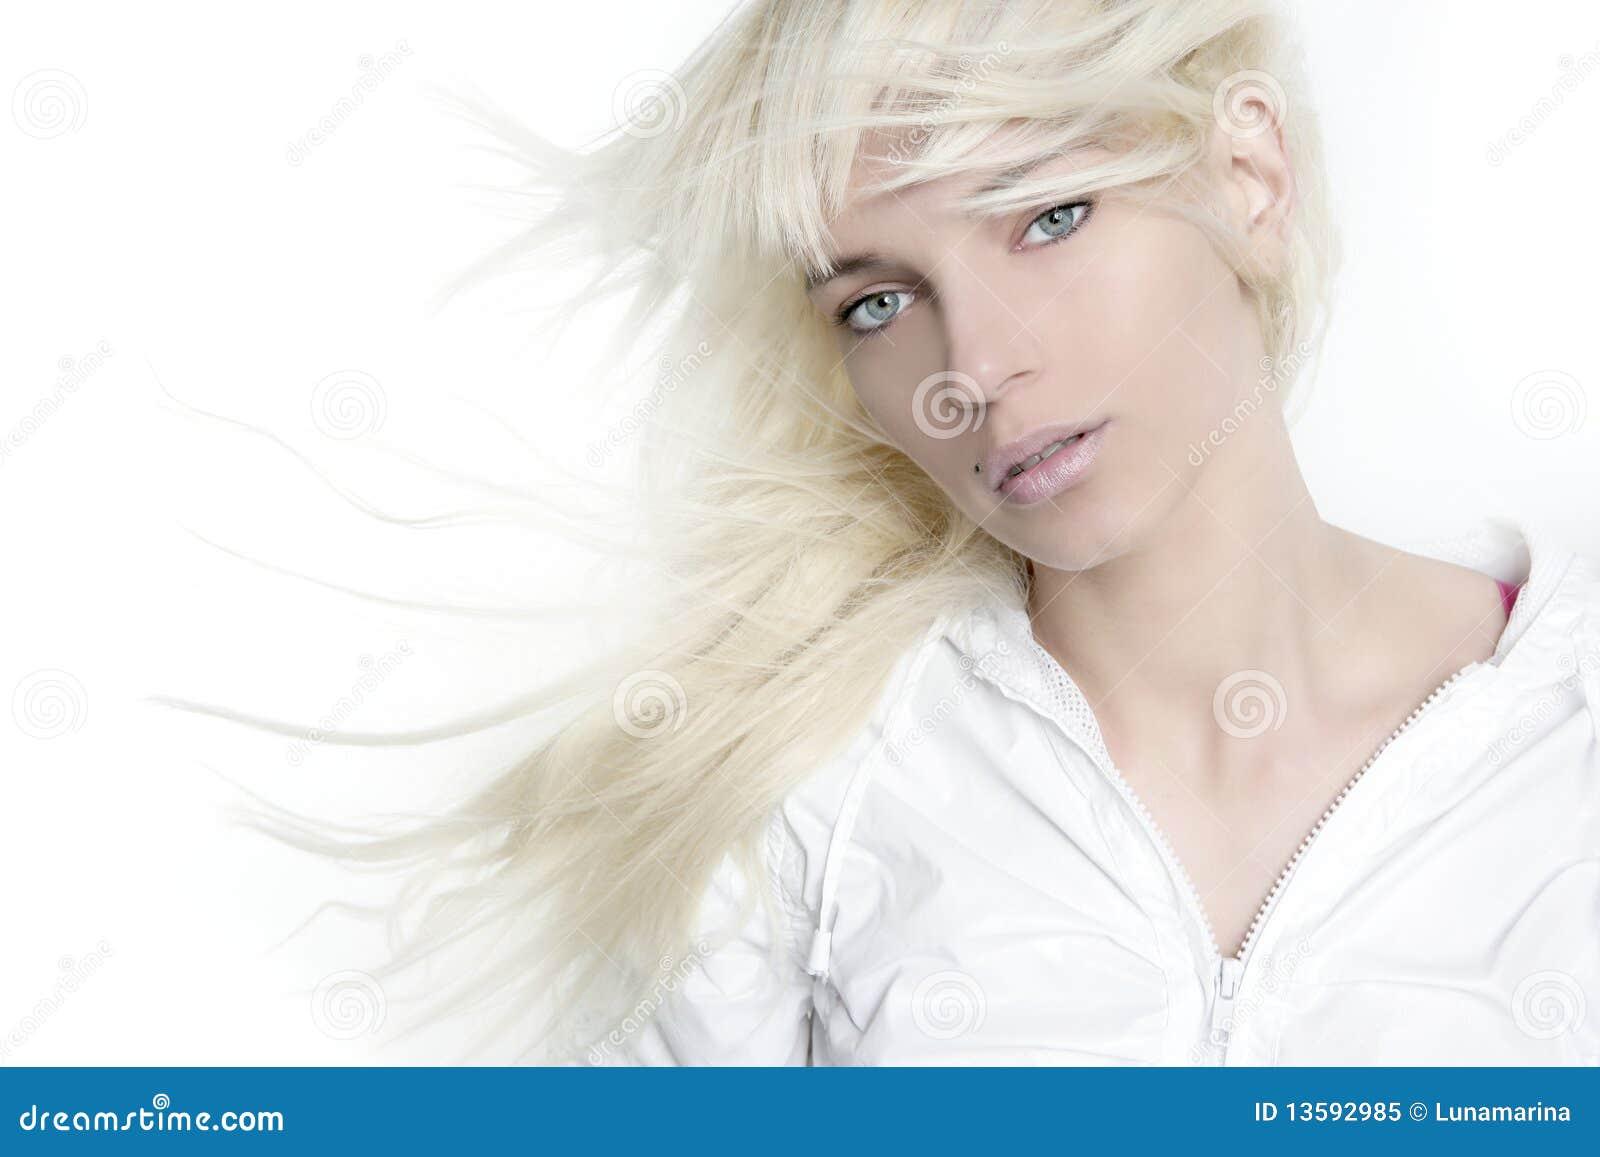 Human Body 3D Model: Blonde Hair Boy'-s Head 3D Model Download,Free ...